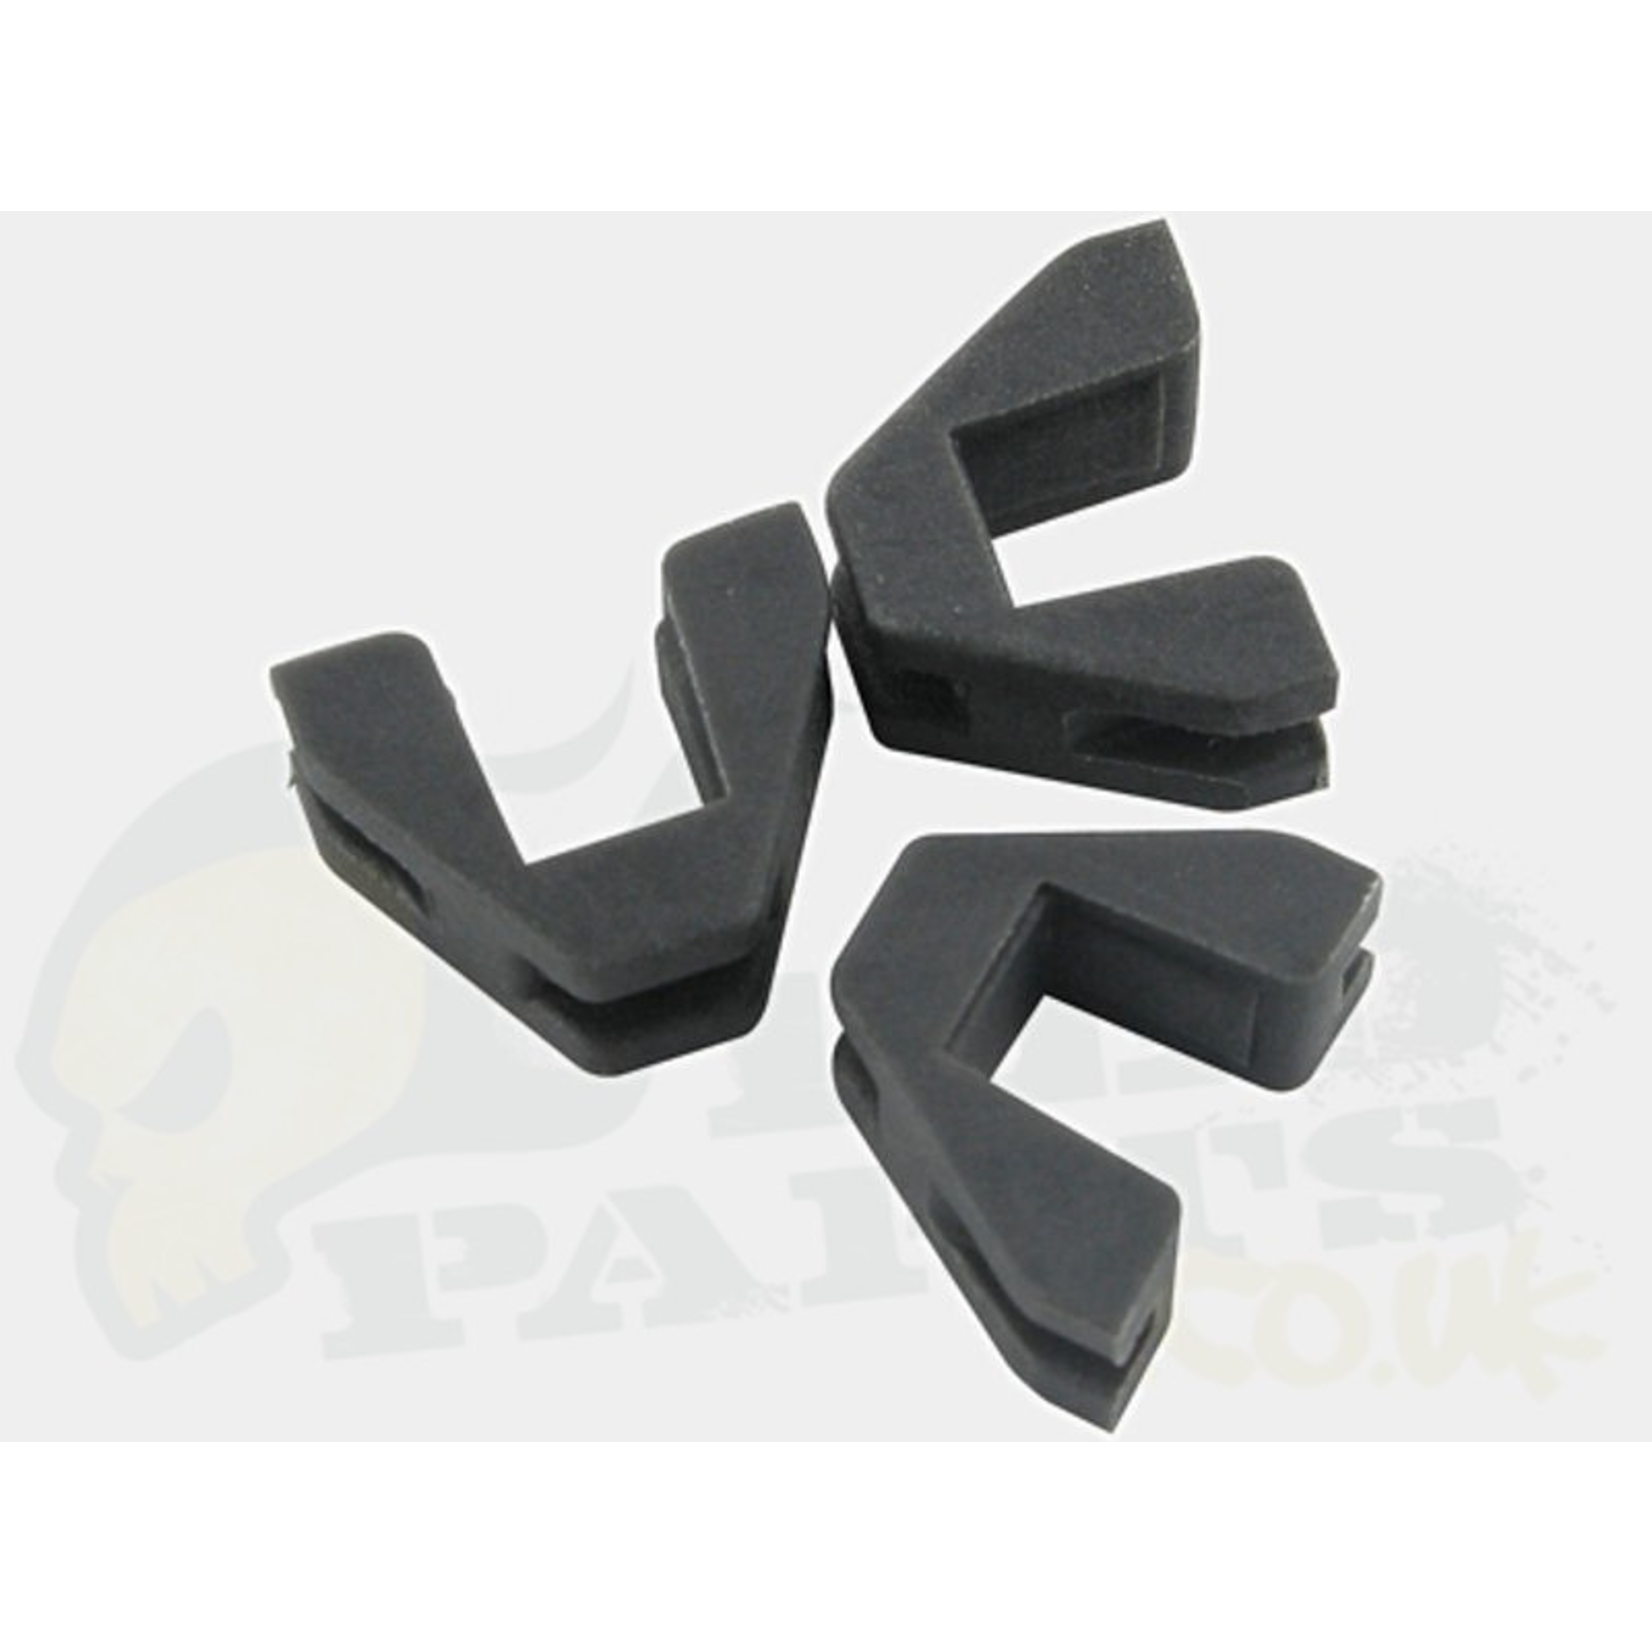 Parts Variator Guide/Sliding Block, 50cc 4-Stroke (3 Req - sold each)